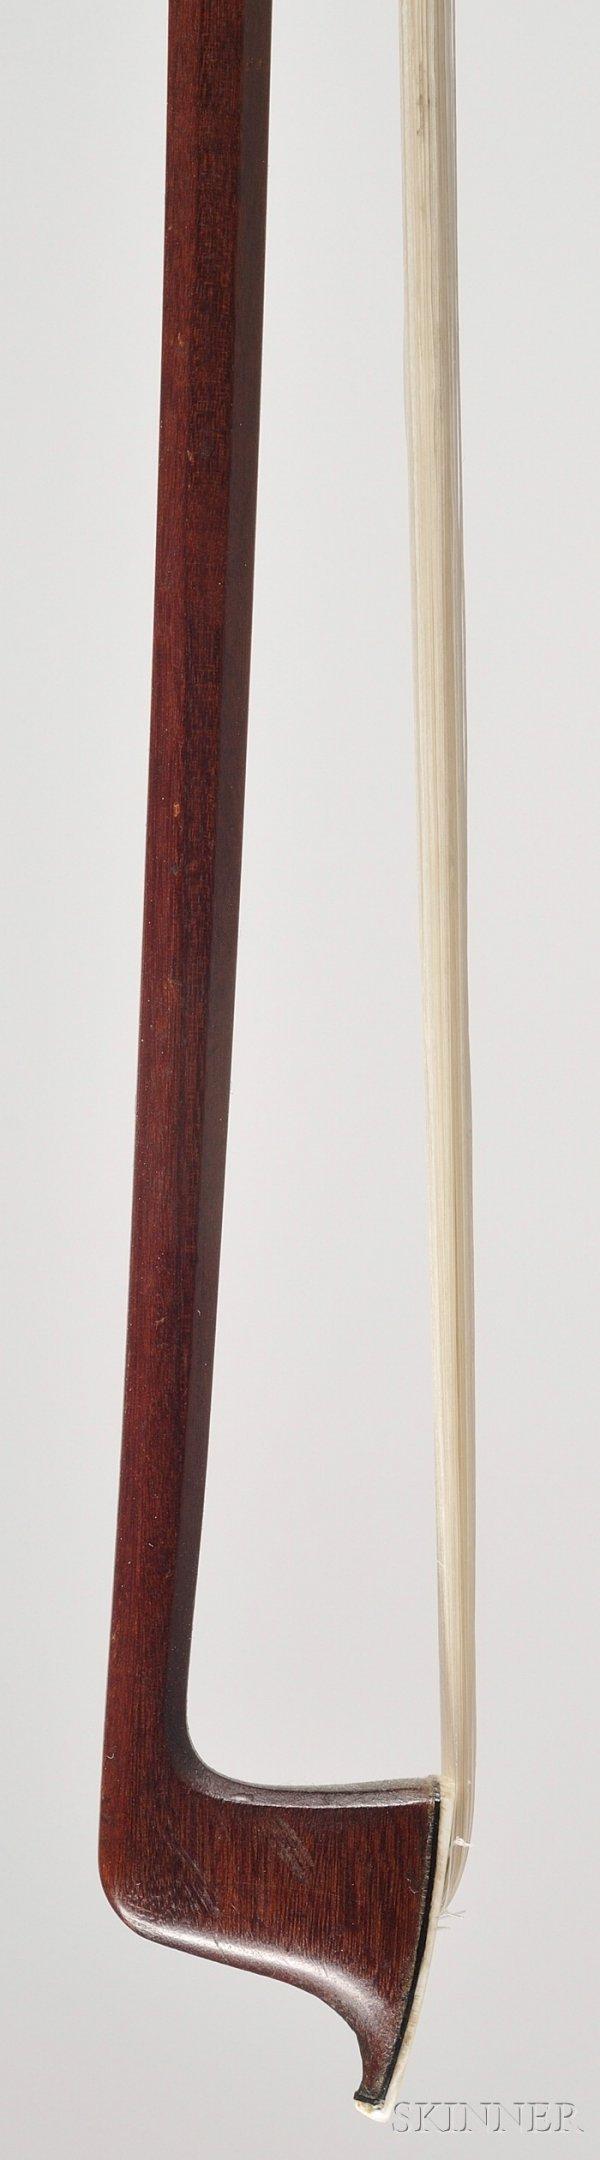 100: French Nickel Mounted Violin Bow, Eugene Sartory,  - 2